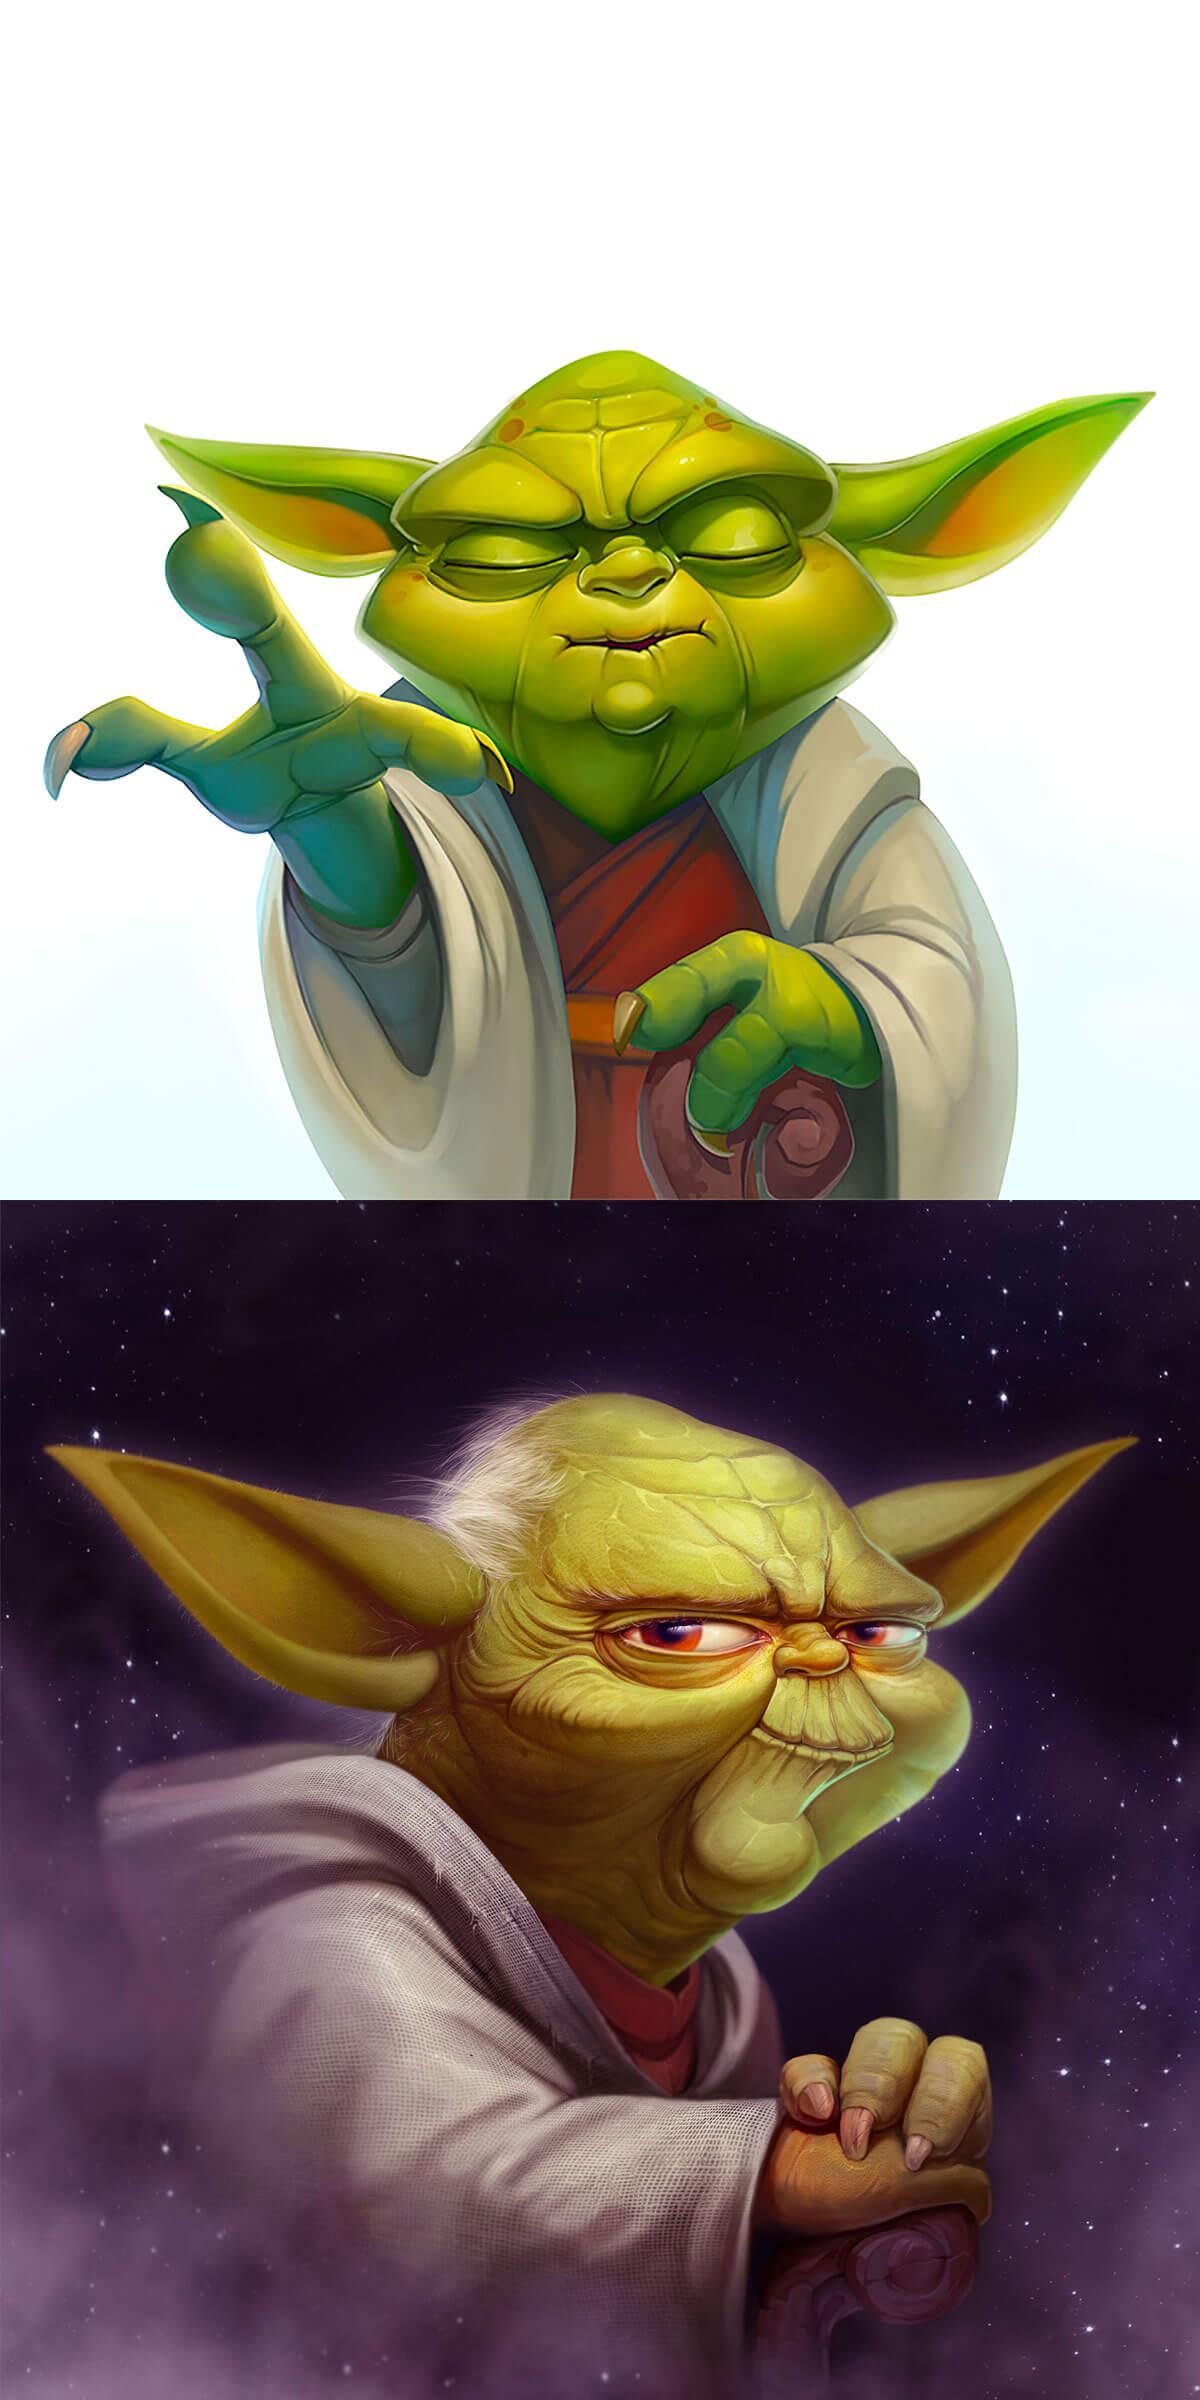 Star Wars Yoda by NestStrix Art